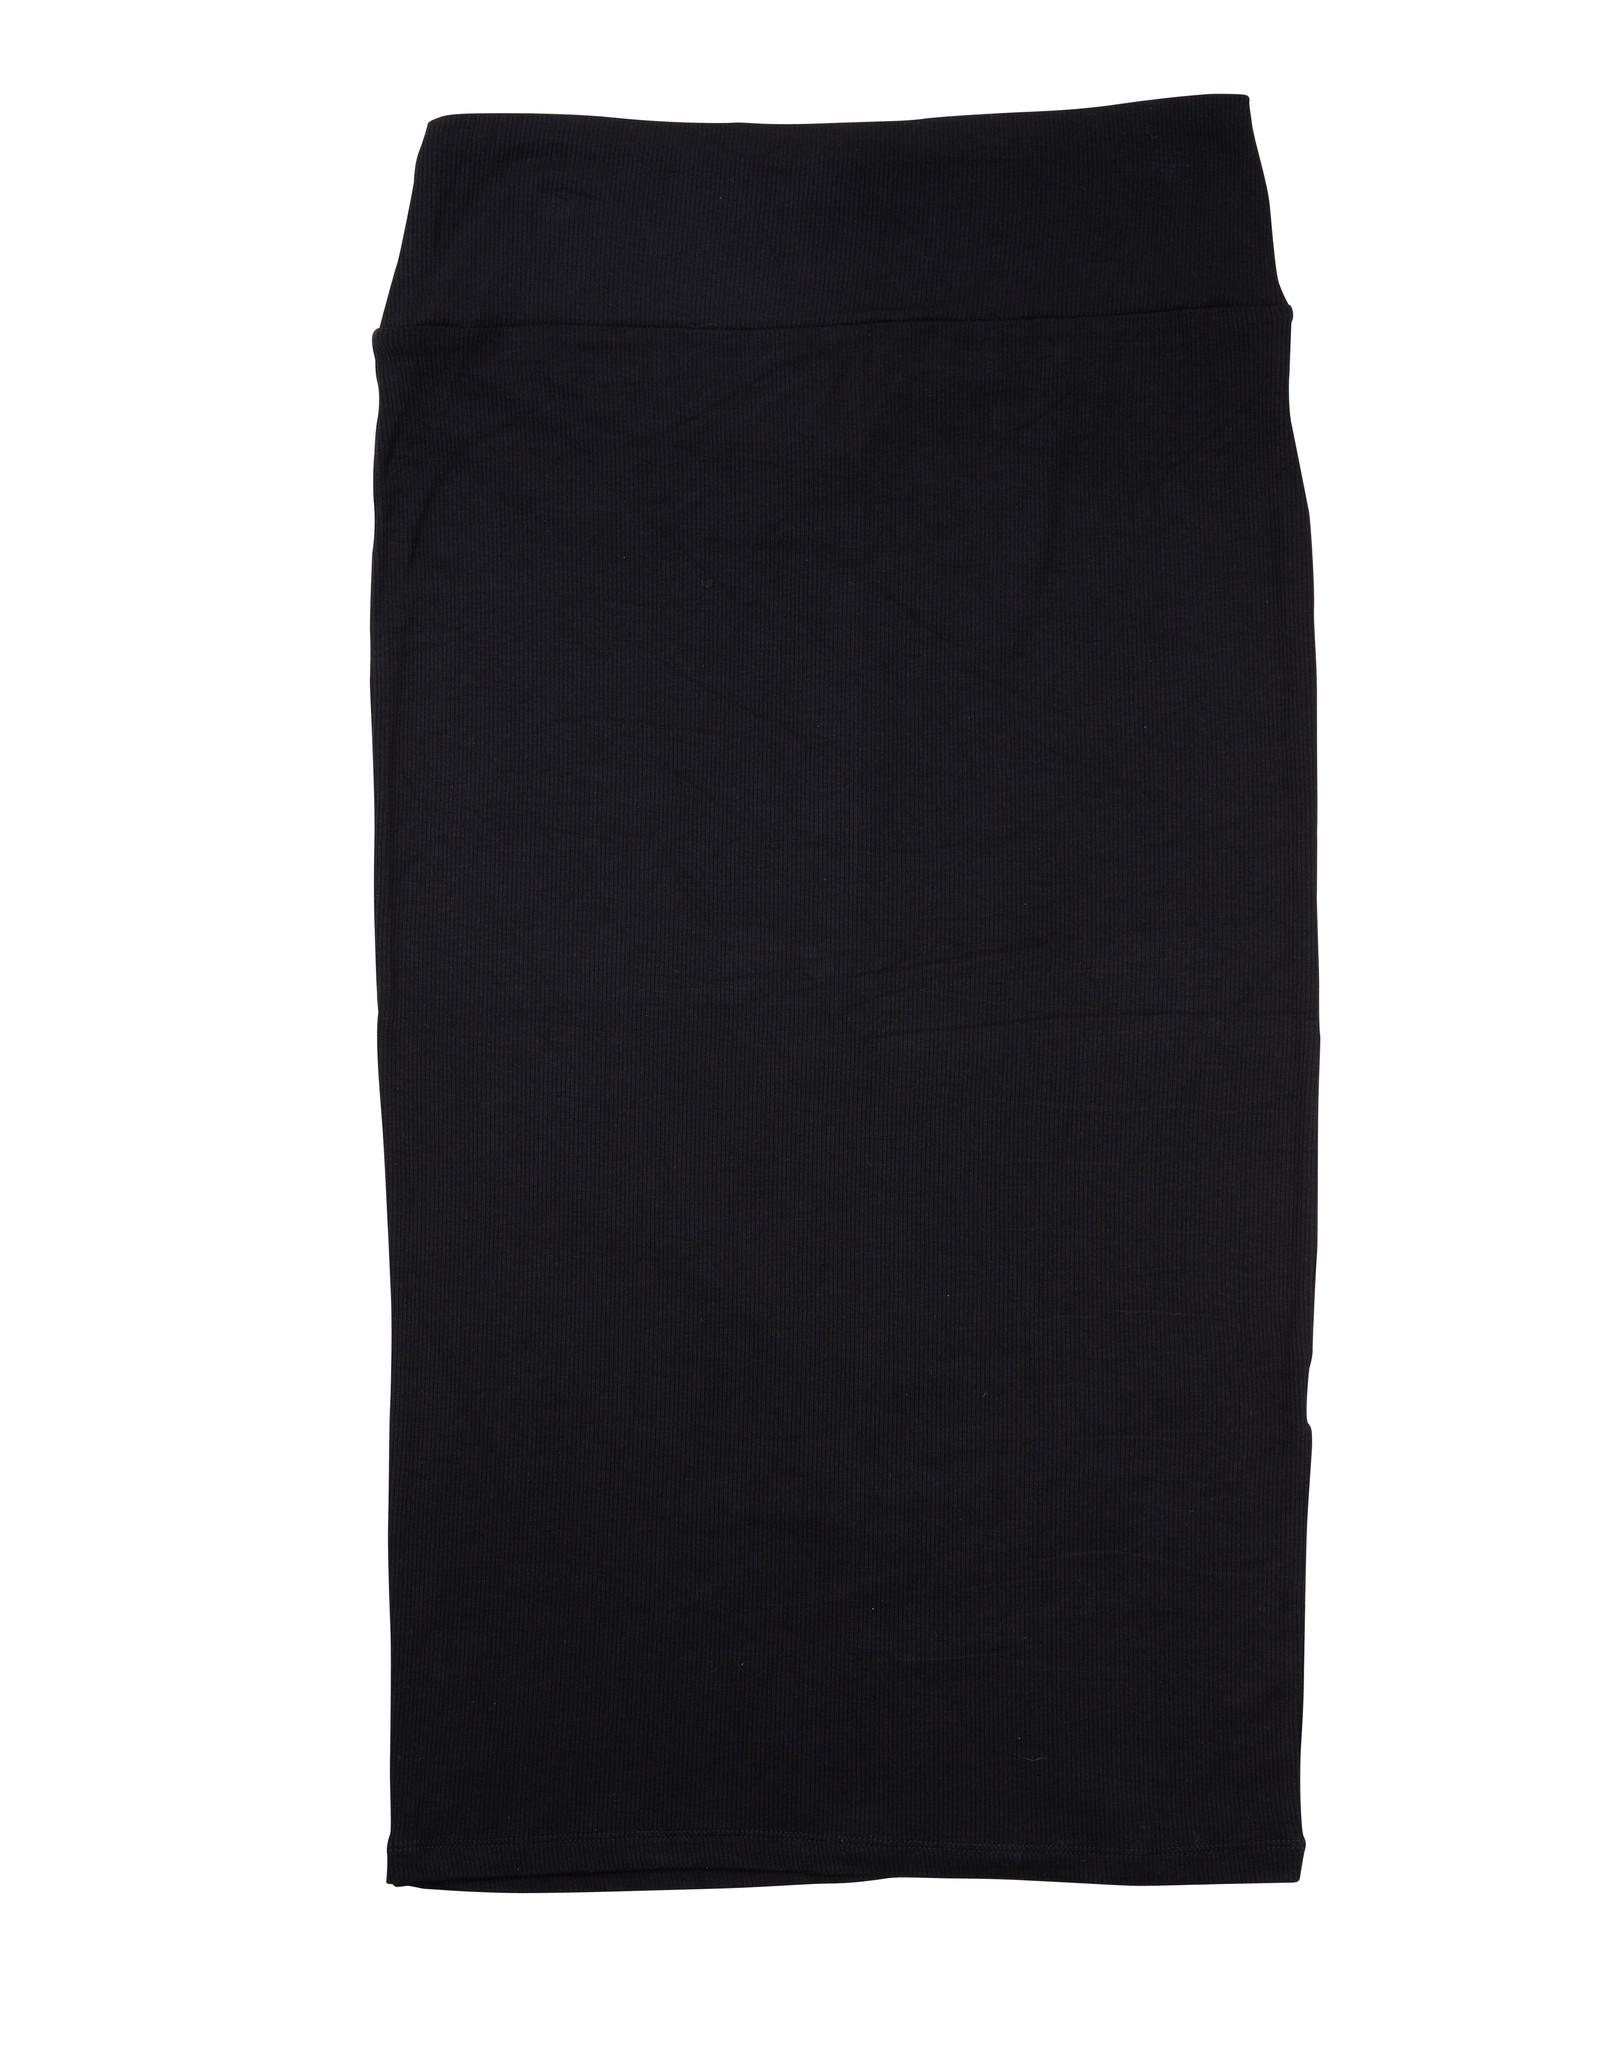 Daniella Faye Daniella Faye Modal Ribbed Set (Skirt/Top)